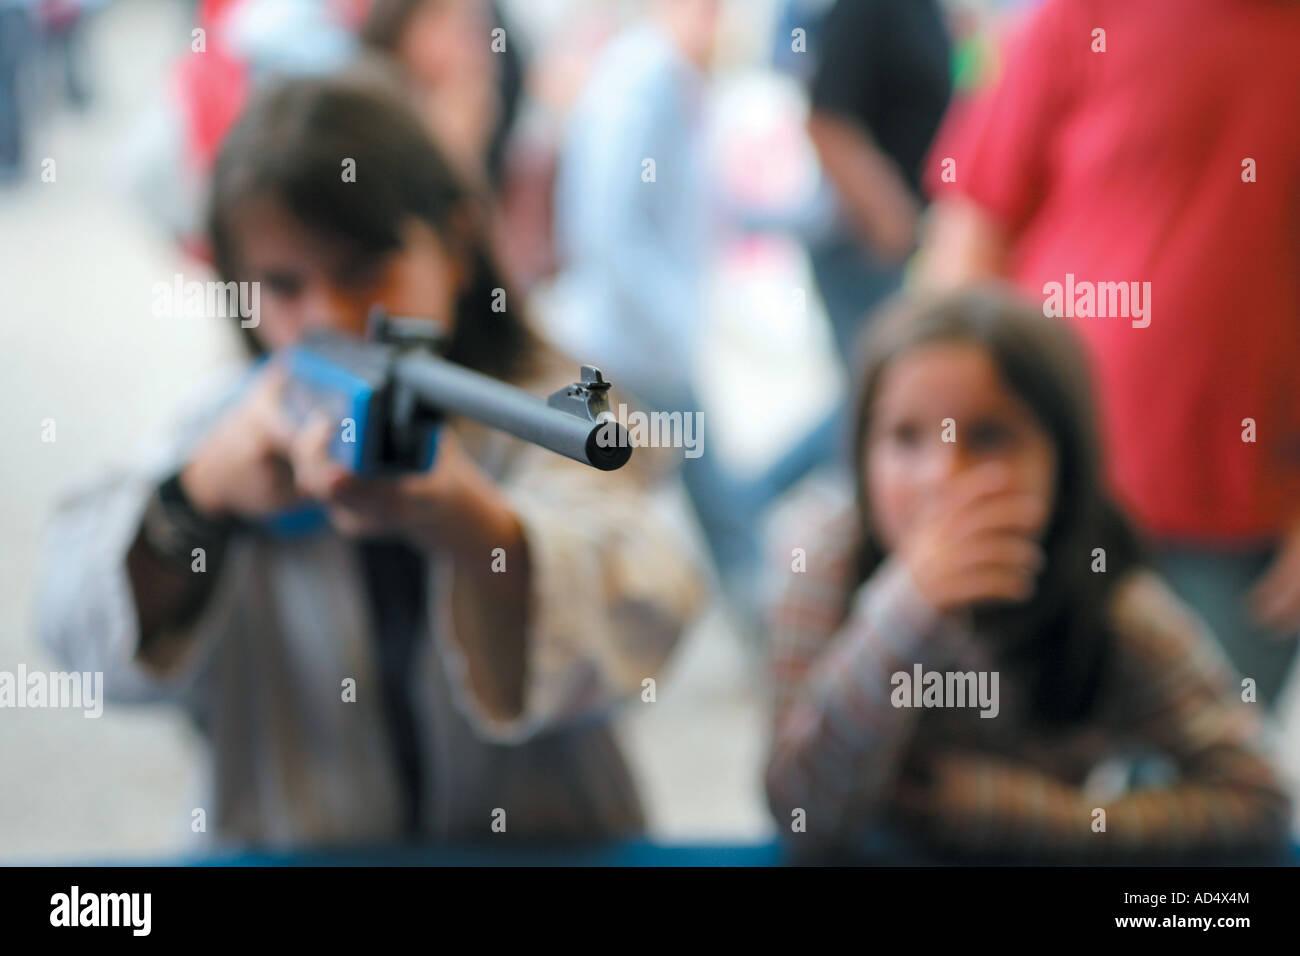 Girls Playing A Shooting Game Stock Photo Alamy